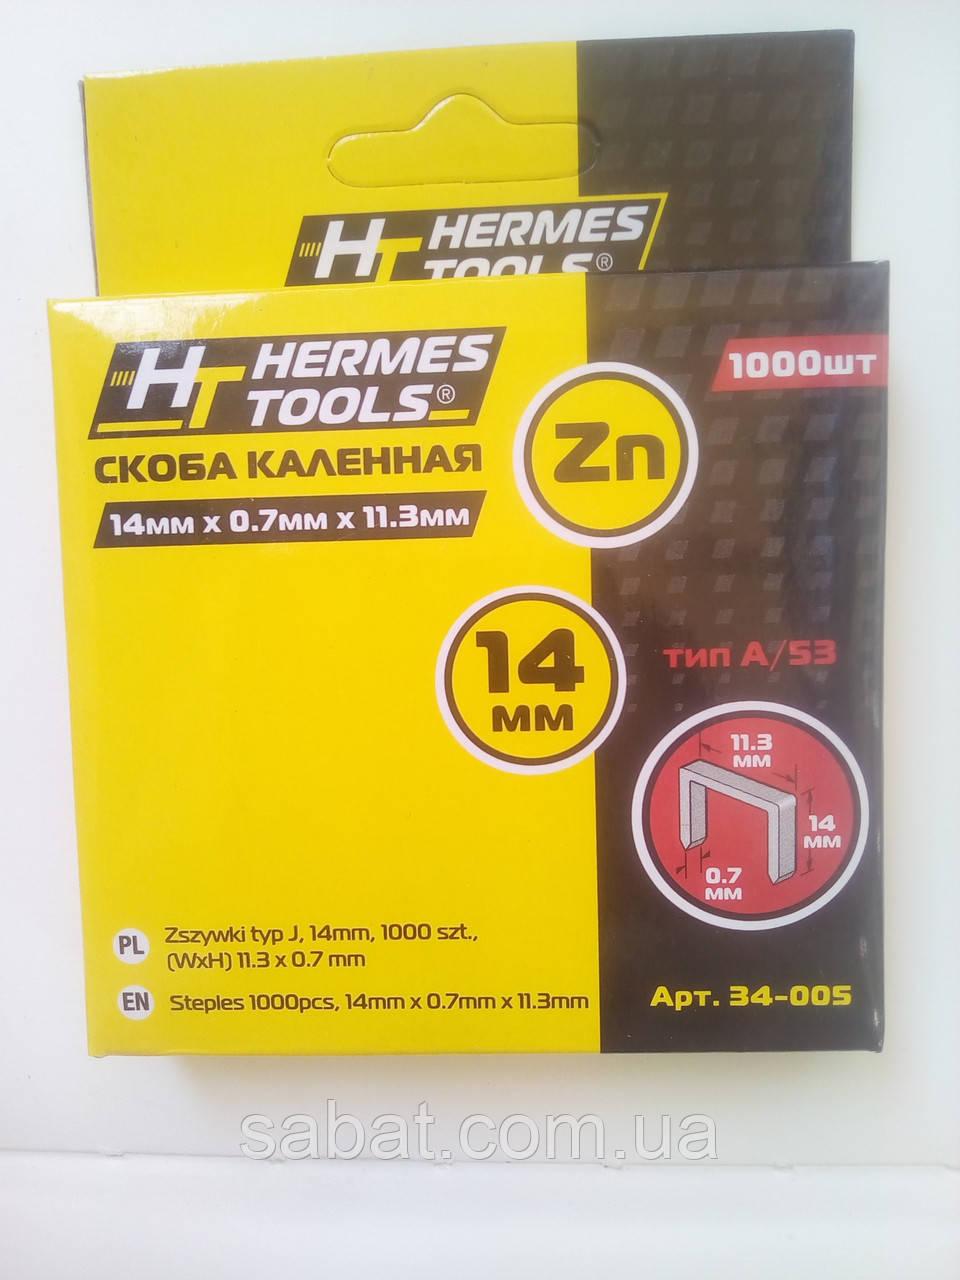 Скоба мебельная 14мм Hermes Tools